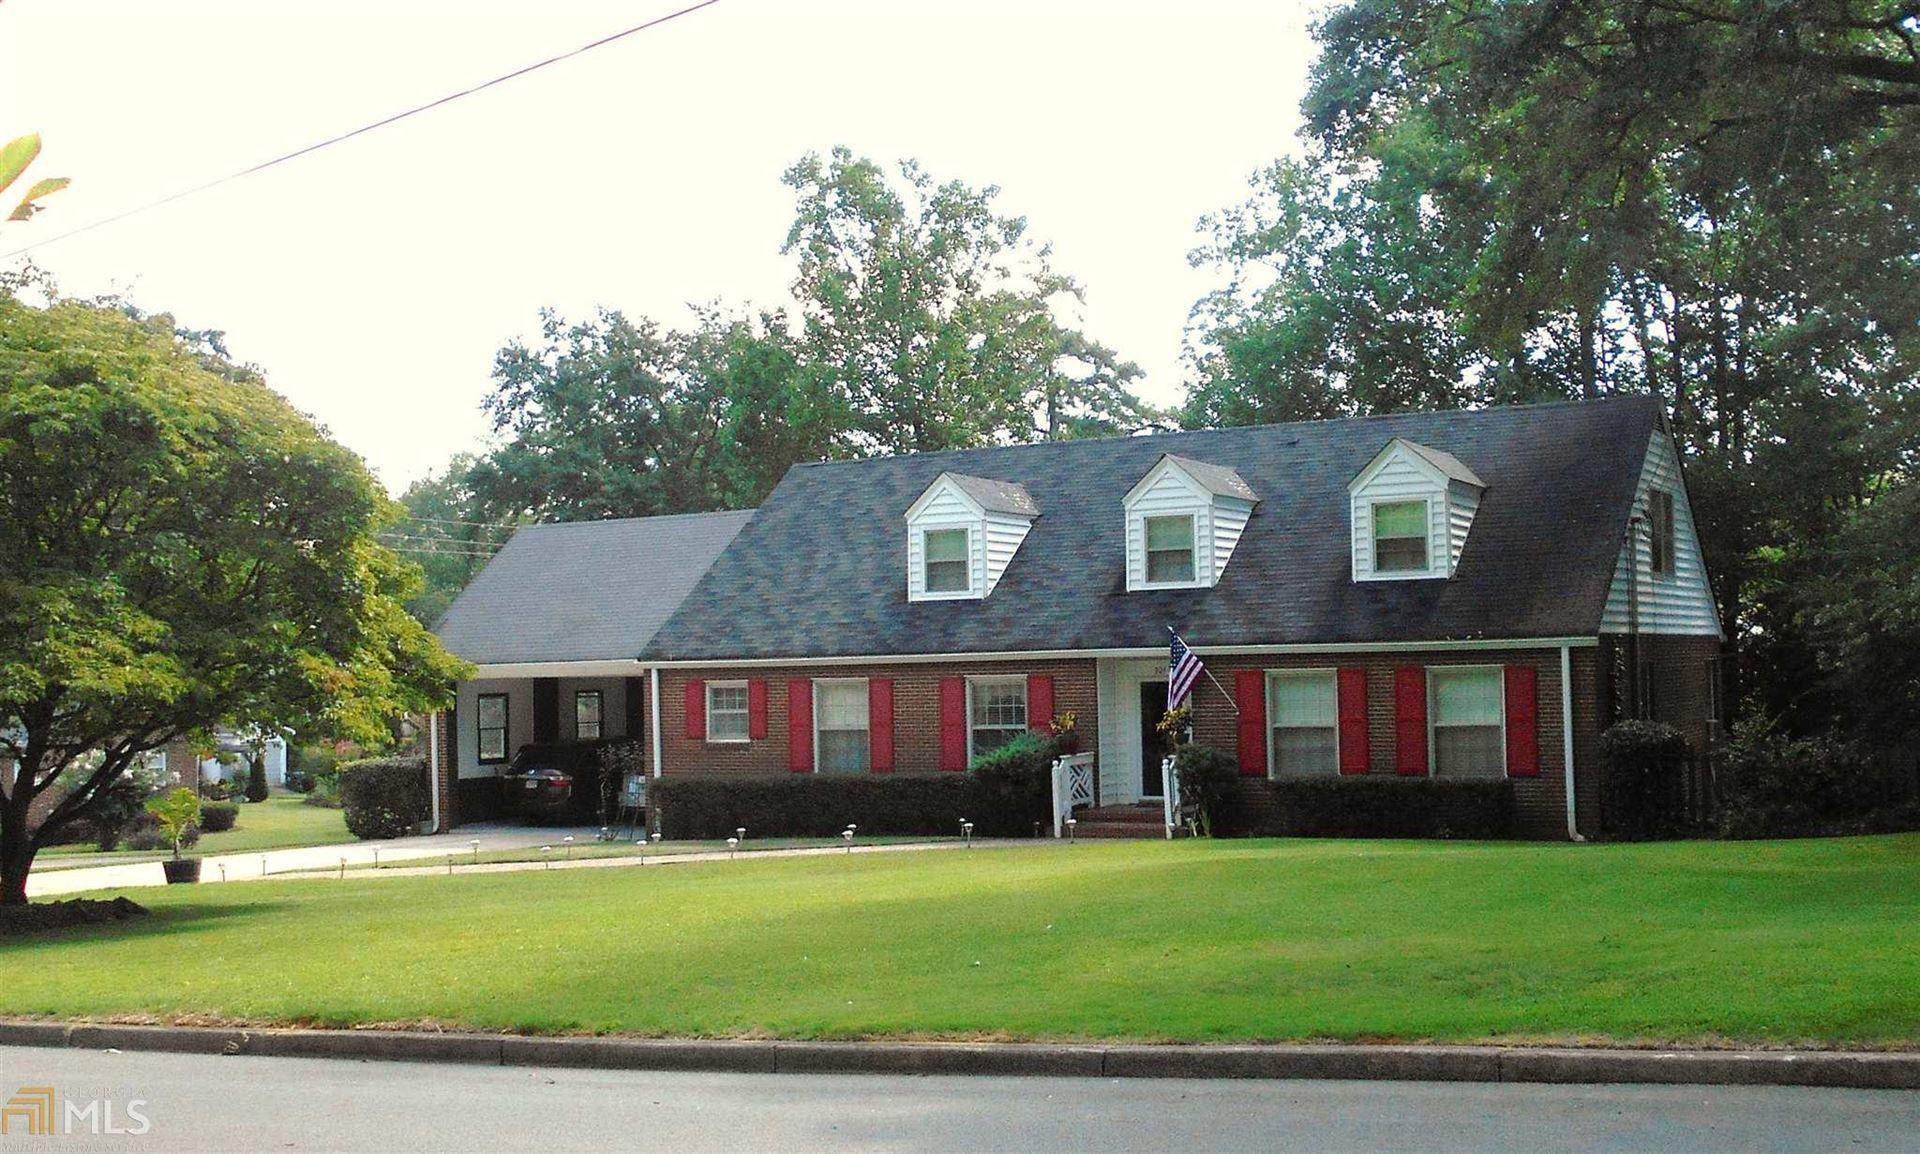 201 Springdale Dr, Thomaston, GA 30286 - MLS#: 8824190